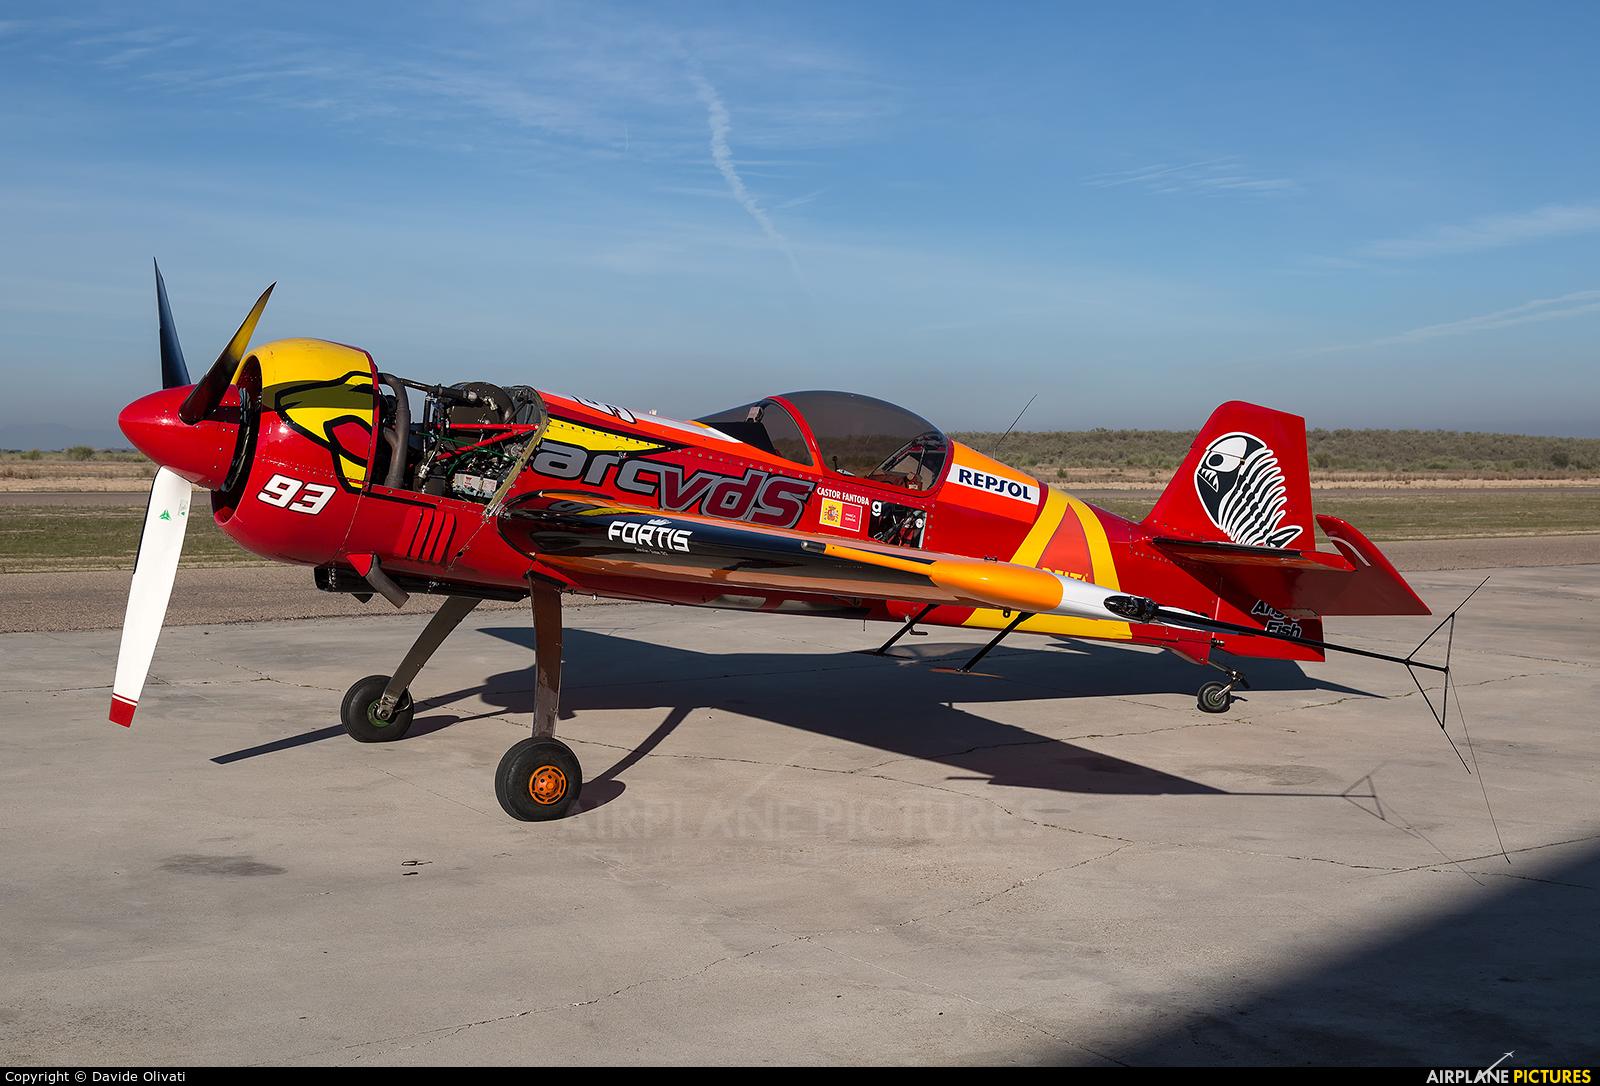 Bravo3/Repsol Team EC-HPD aircraft at Casarrubios del Monte